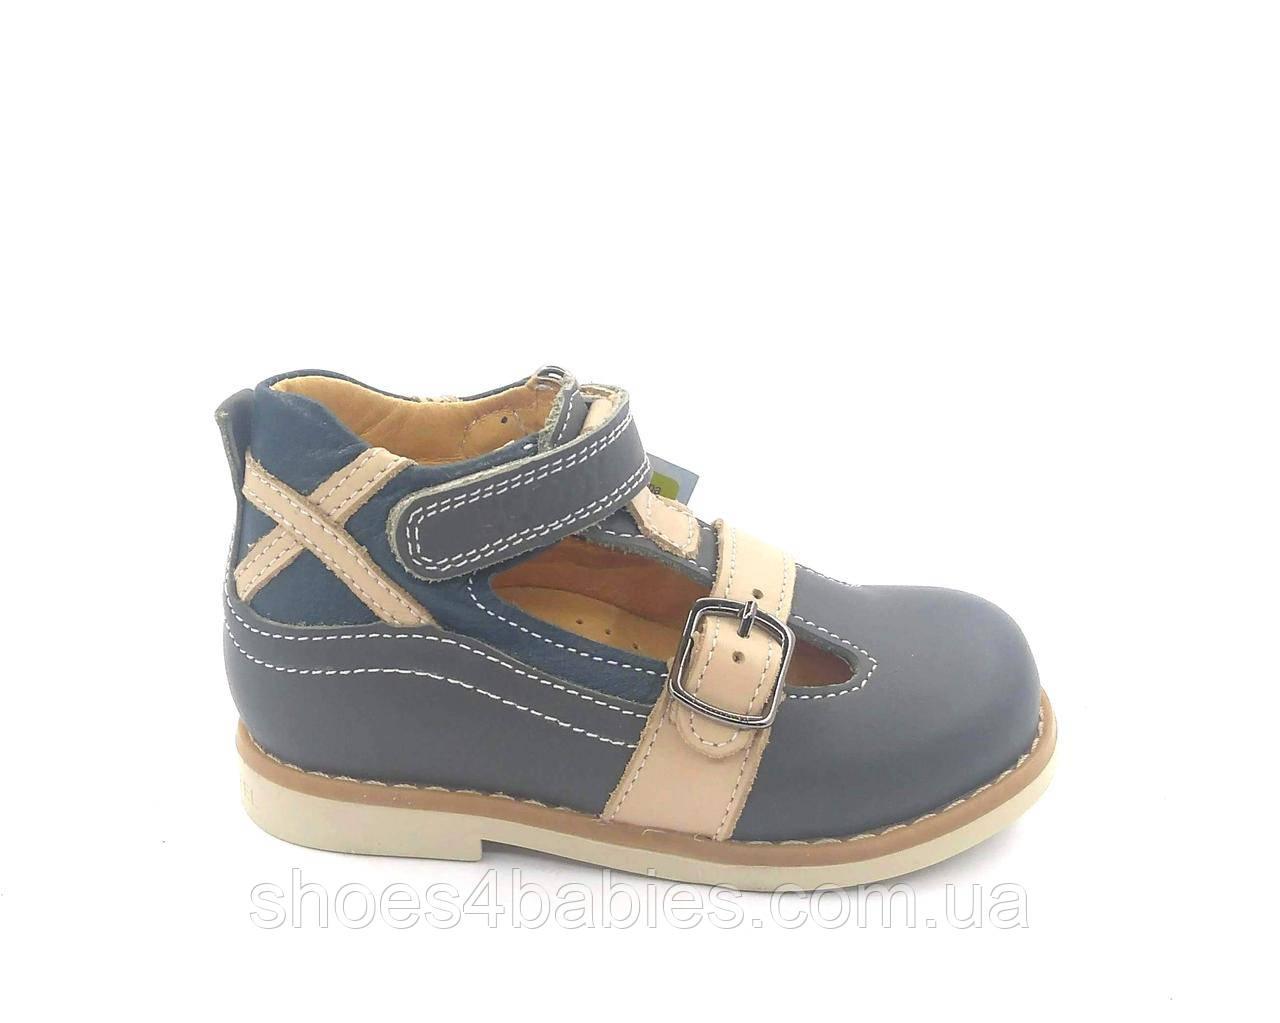 Туфлі ортопедичні Ecoby 107G р. 20-30